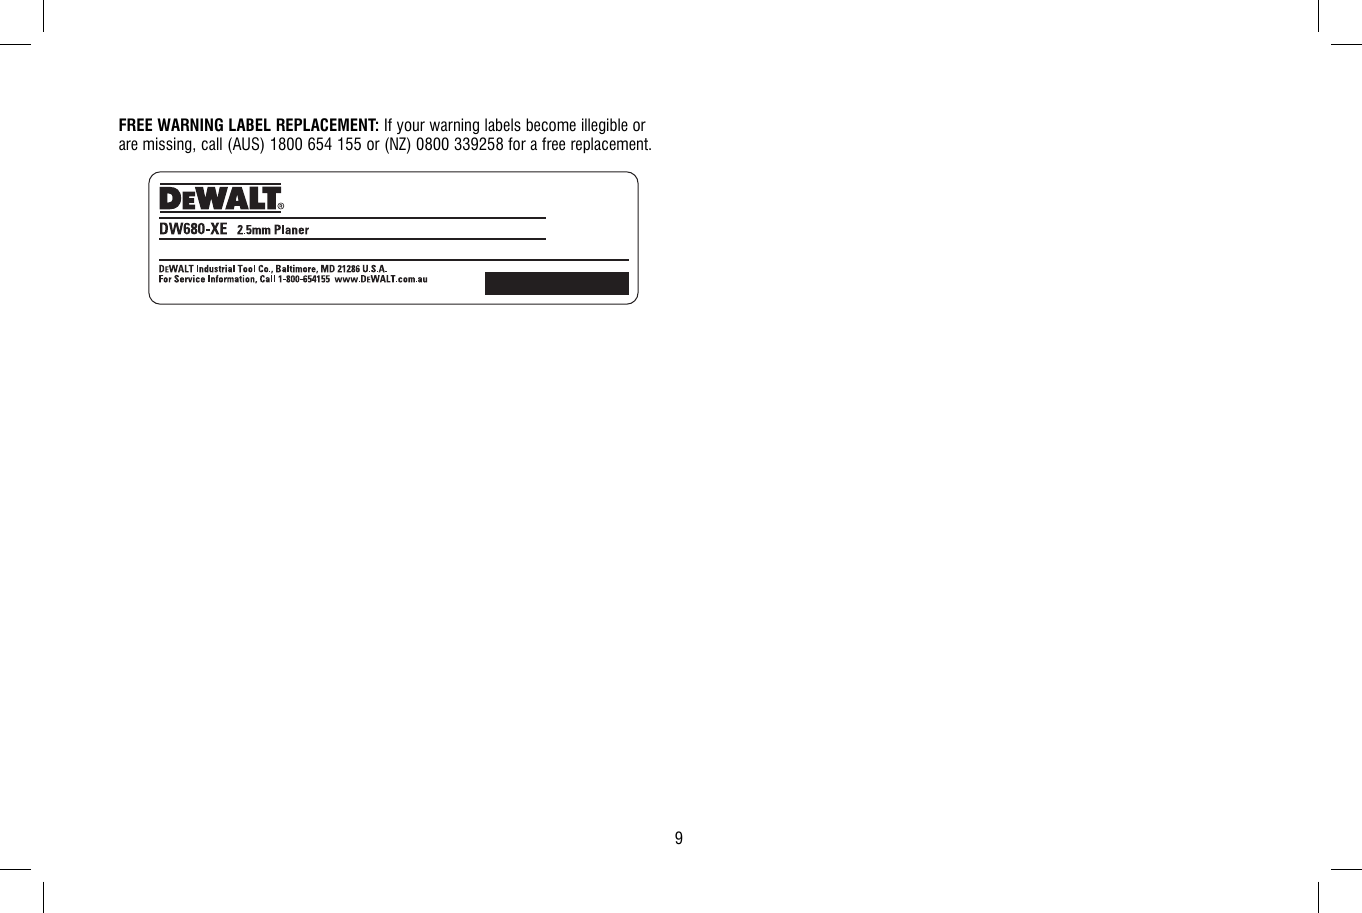 dewalt dw680 xe instruction manual n090451 man planer rh usermanual wiki dewalt dw680 owners manual